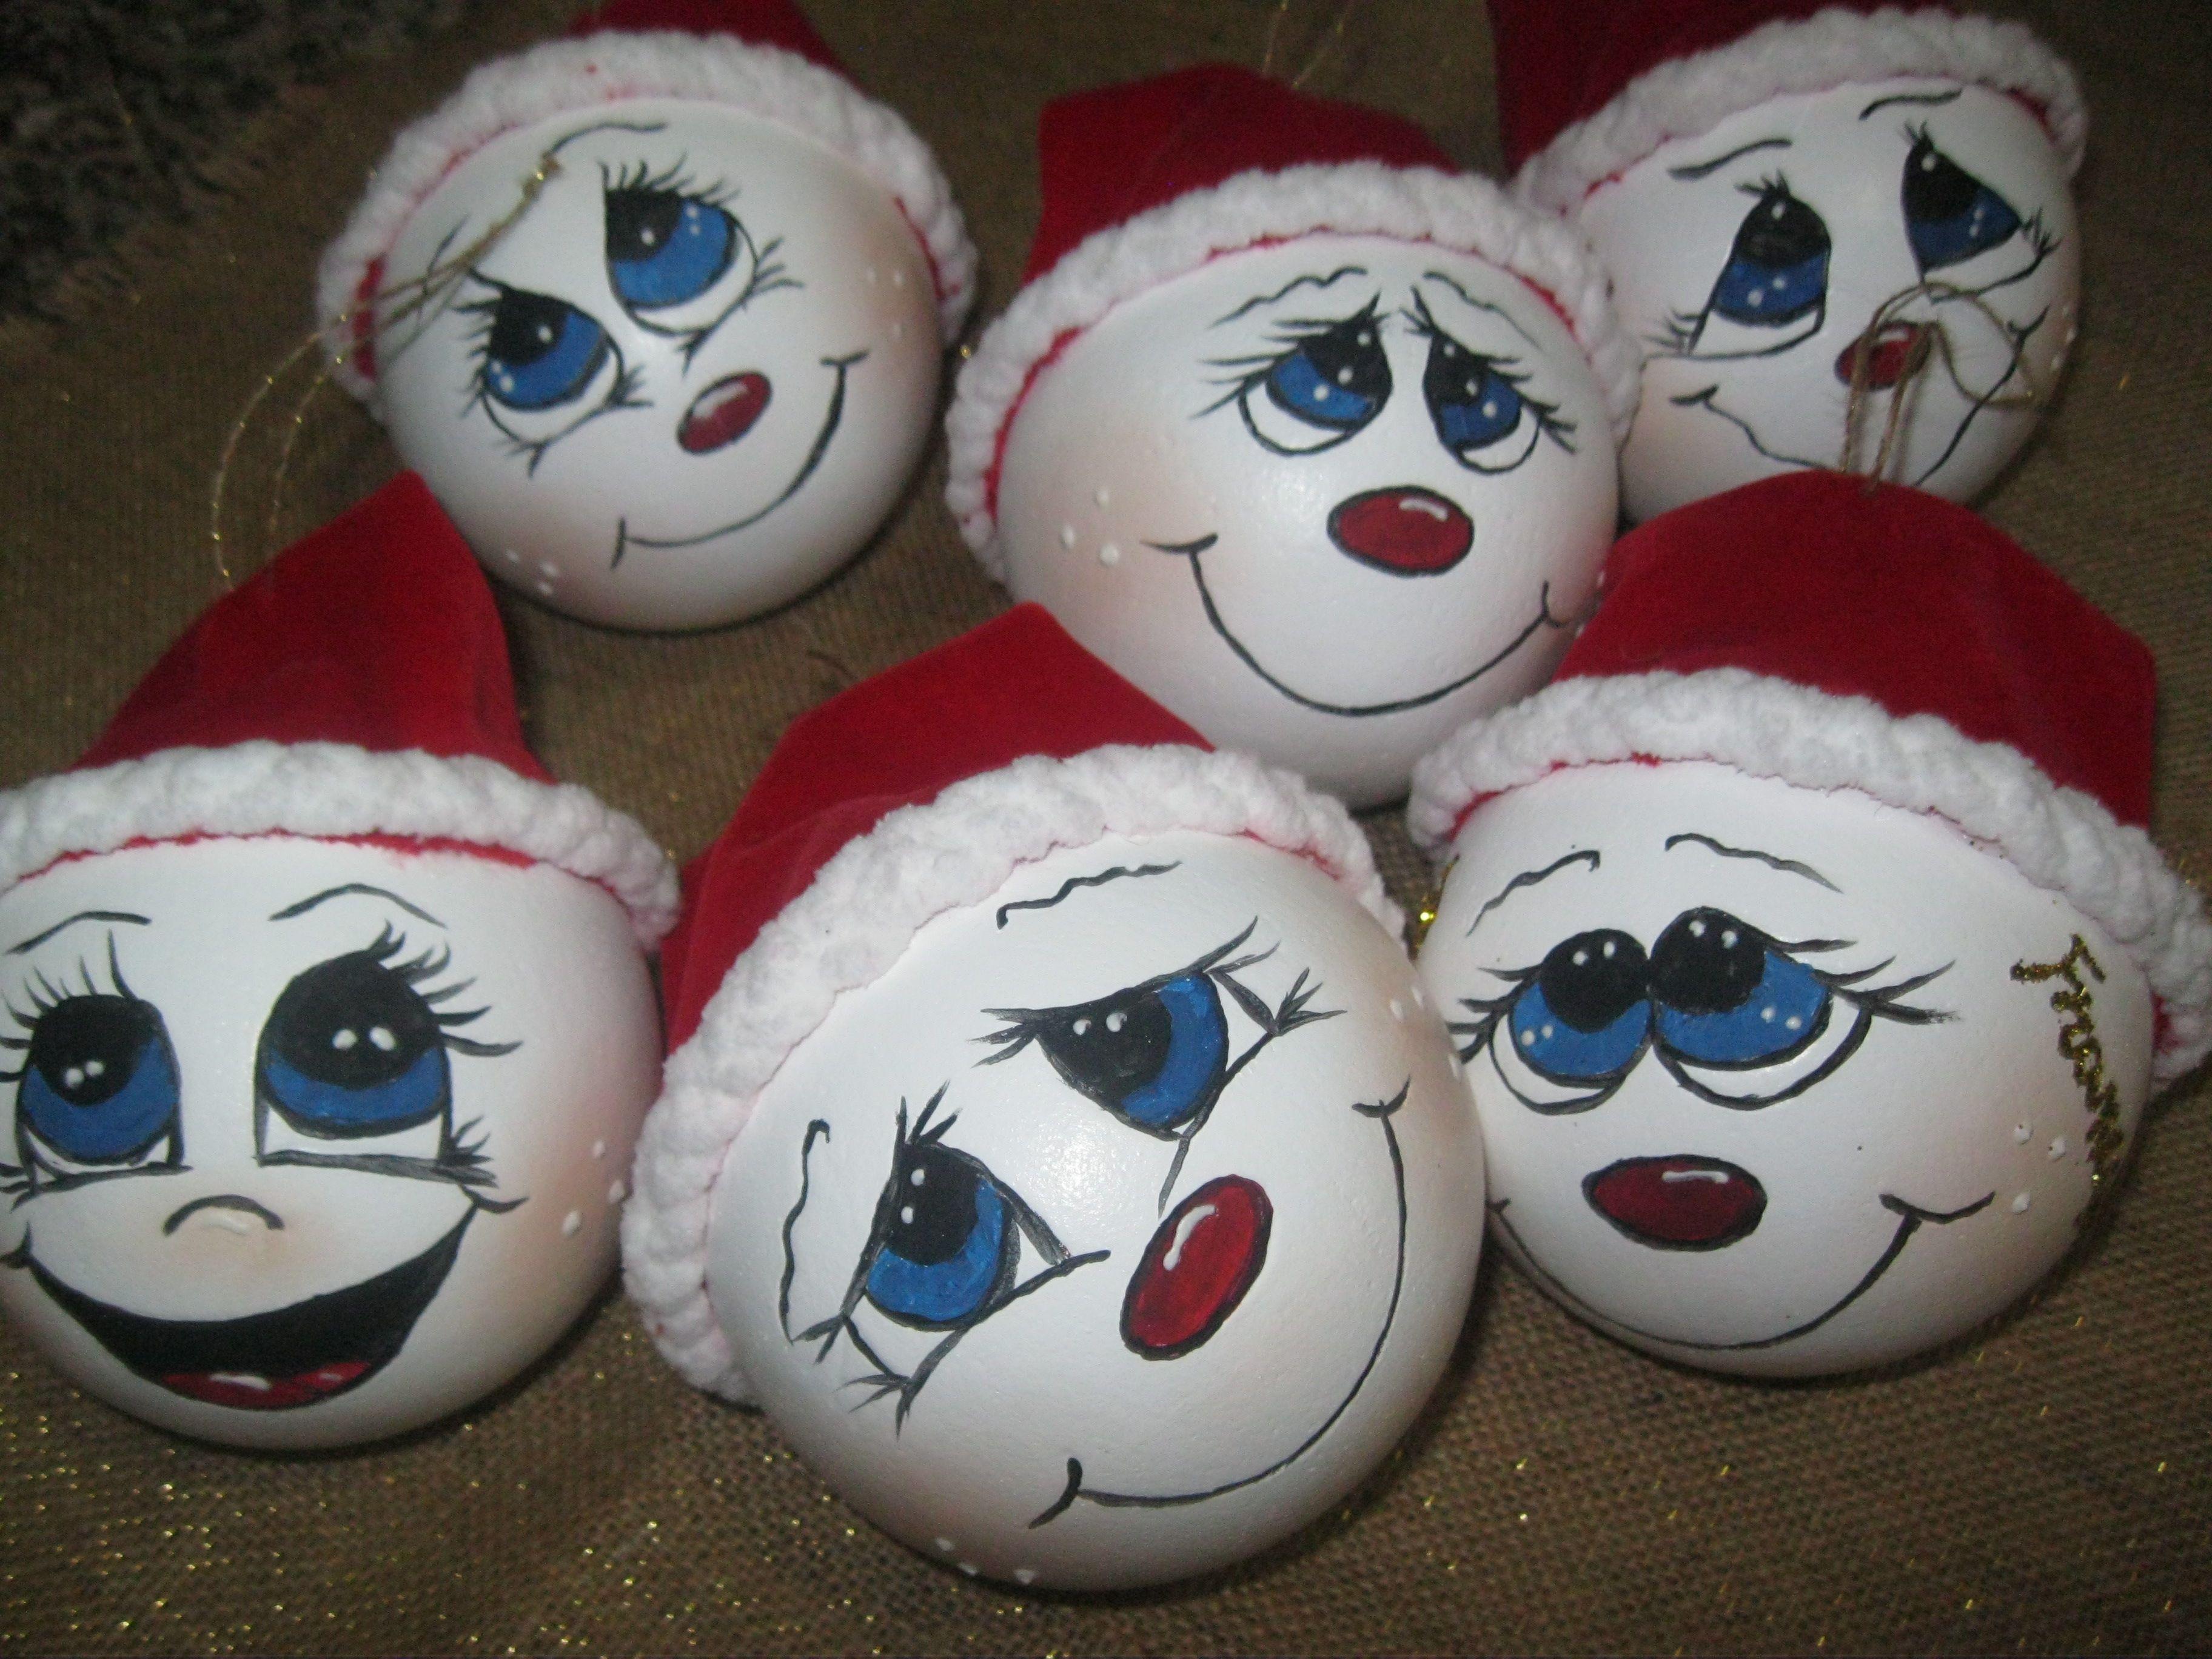 palle di neve animate